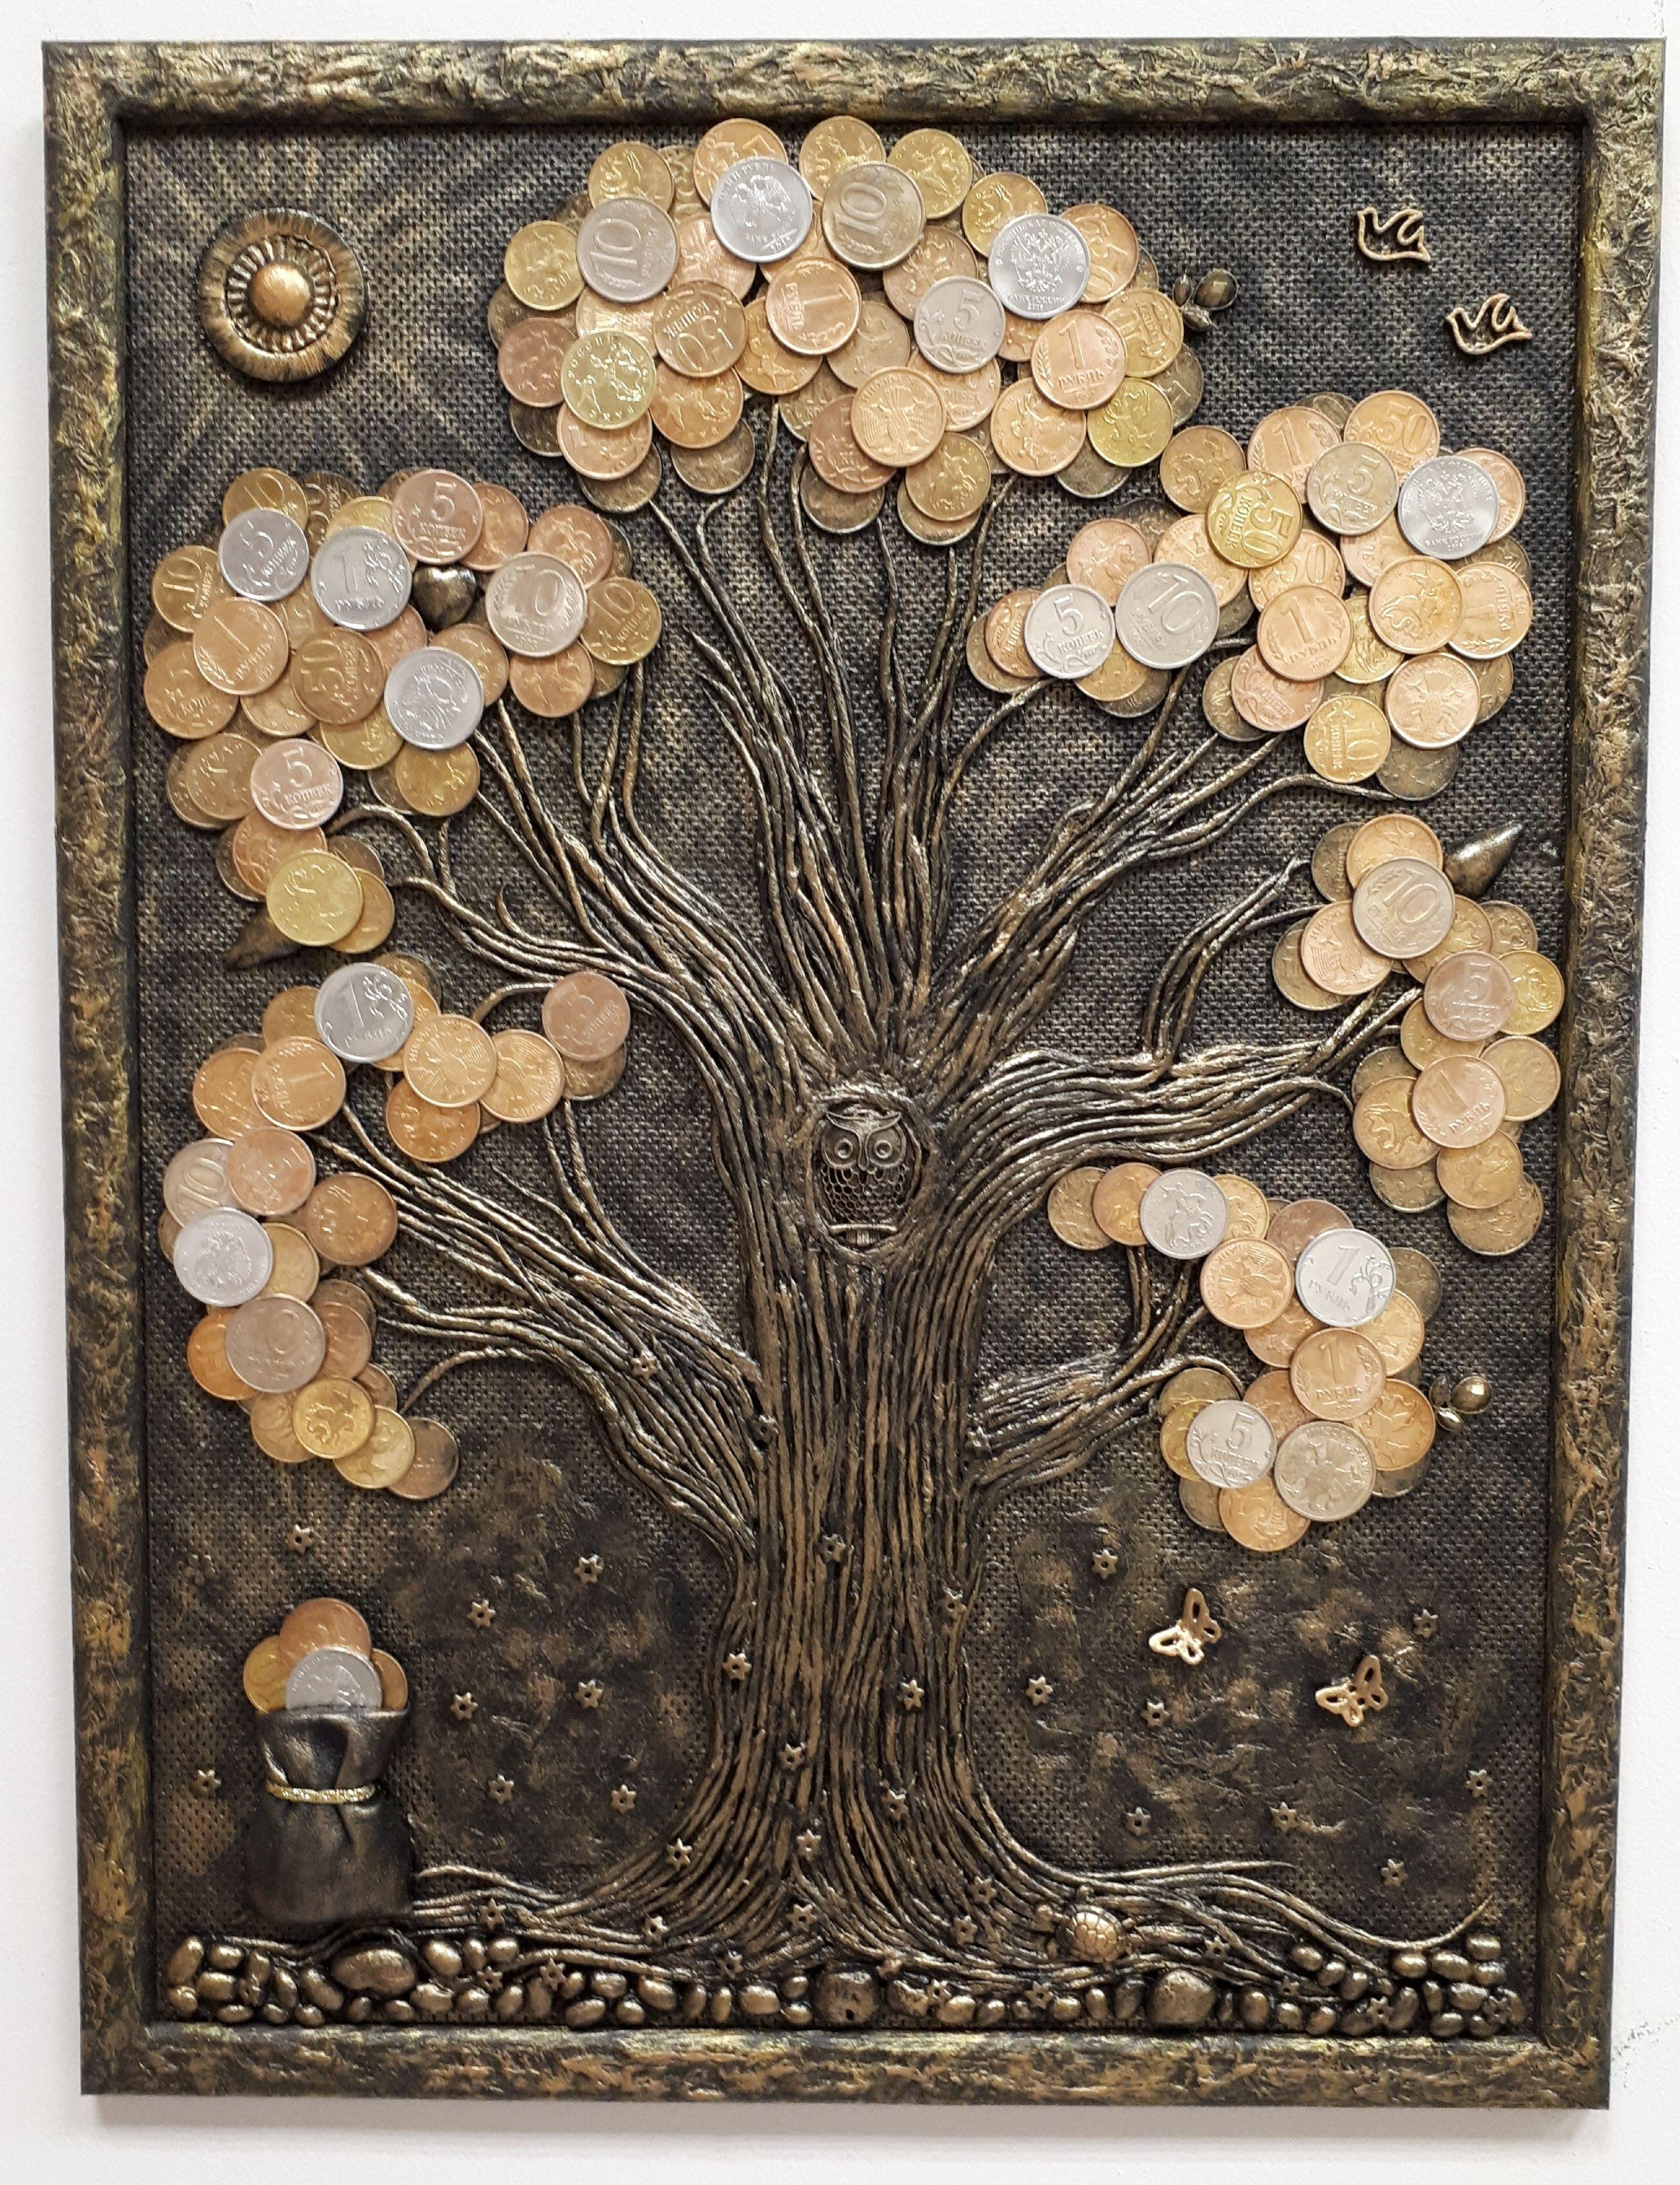 tree coins art | Clay | Coin art, Art, Coin crafts